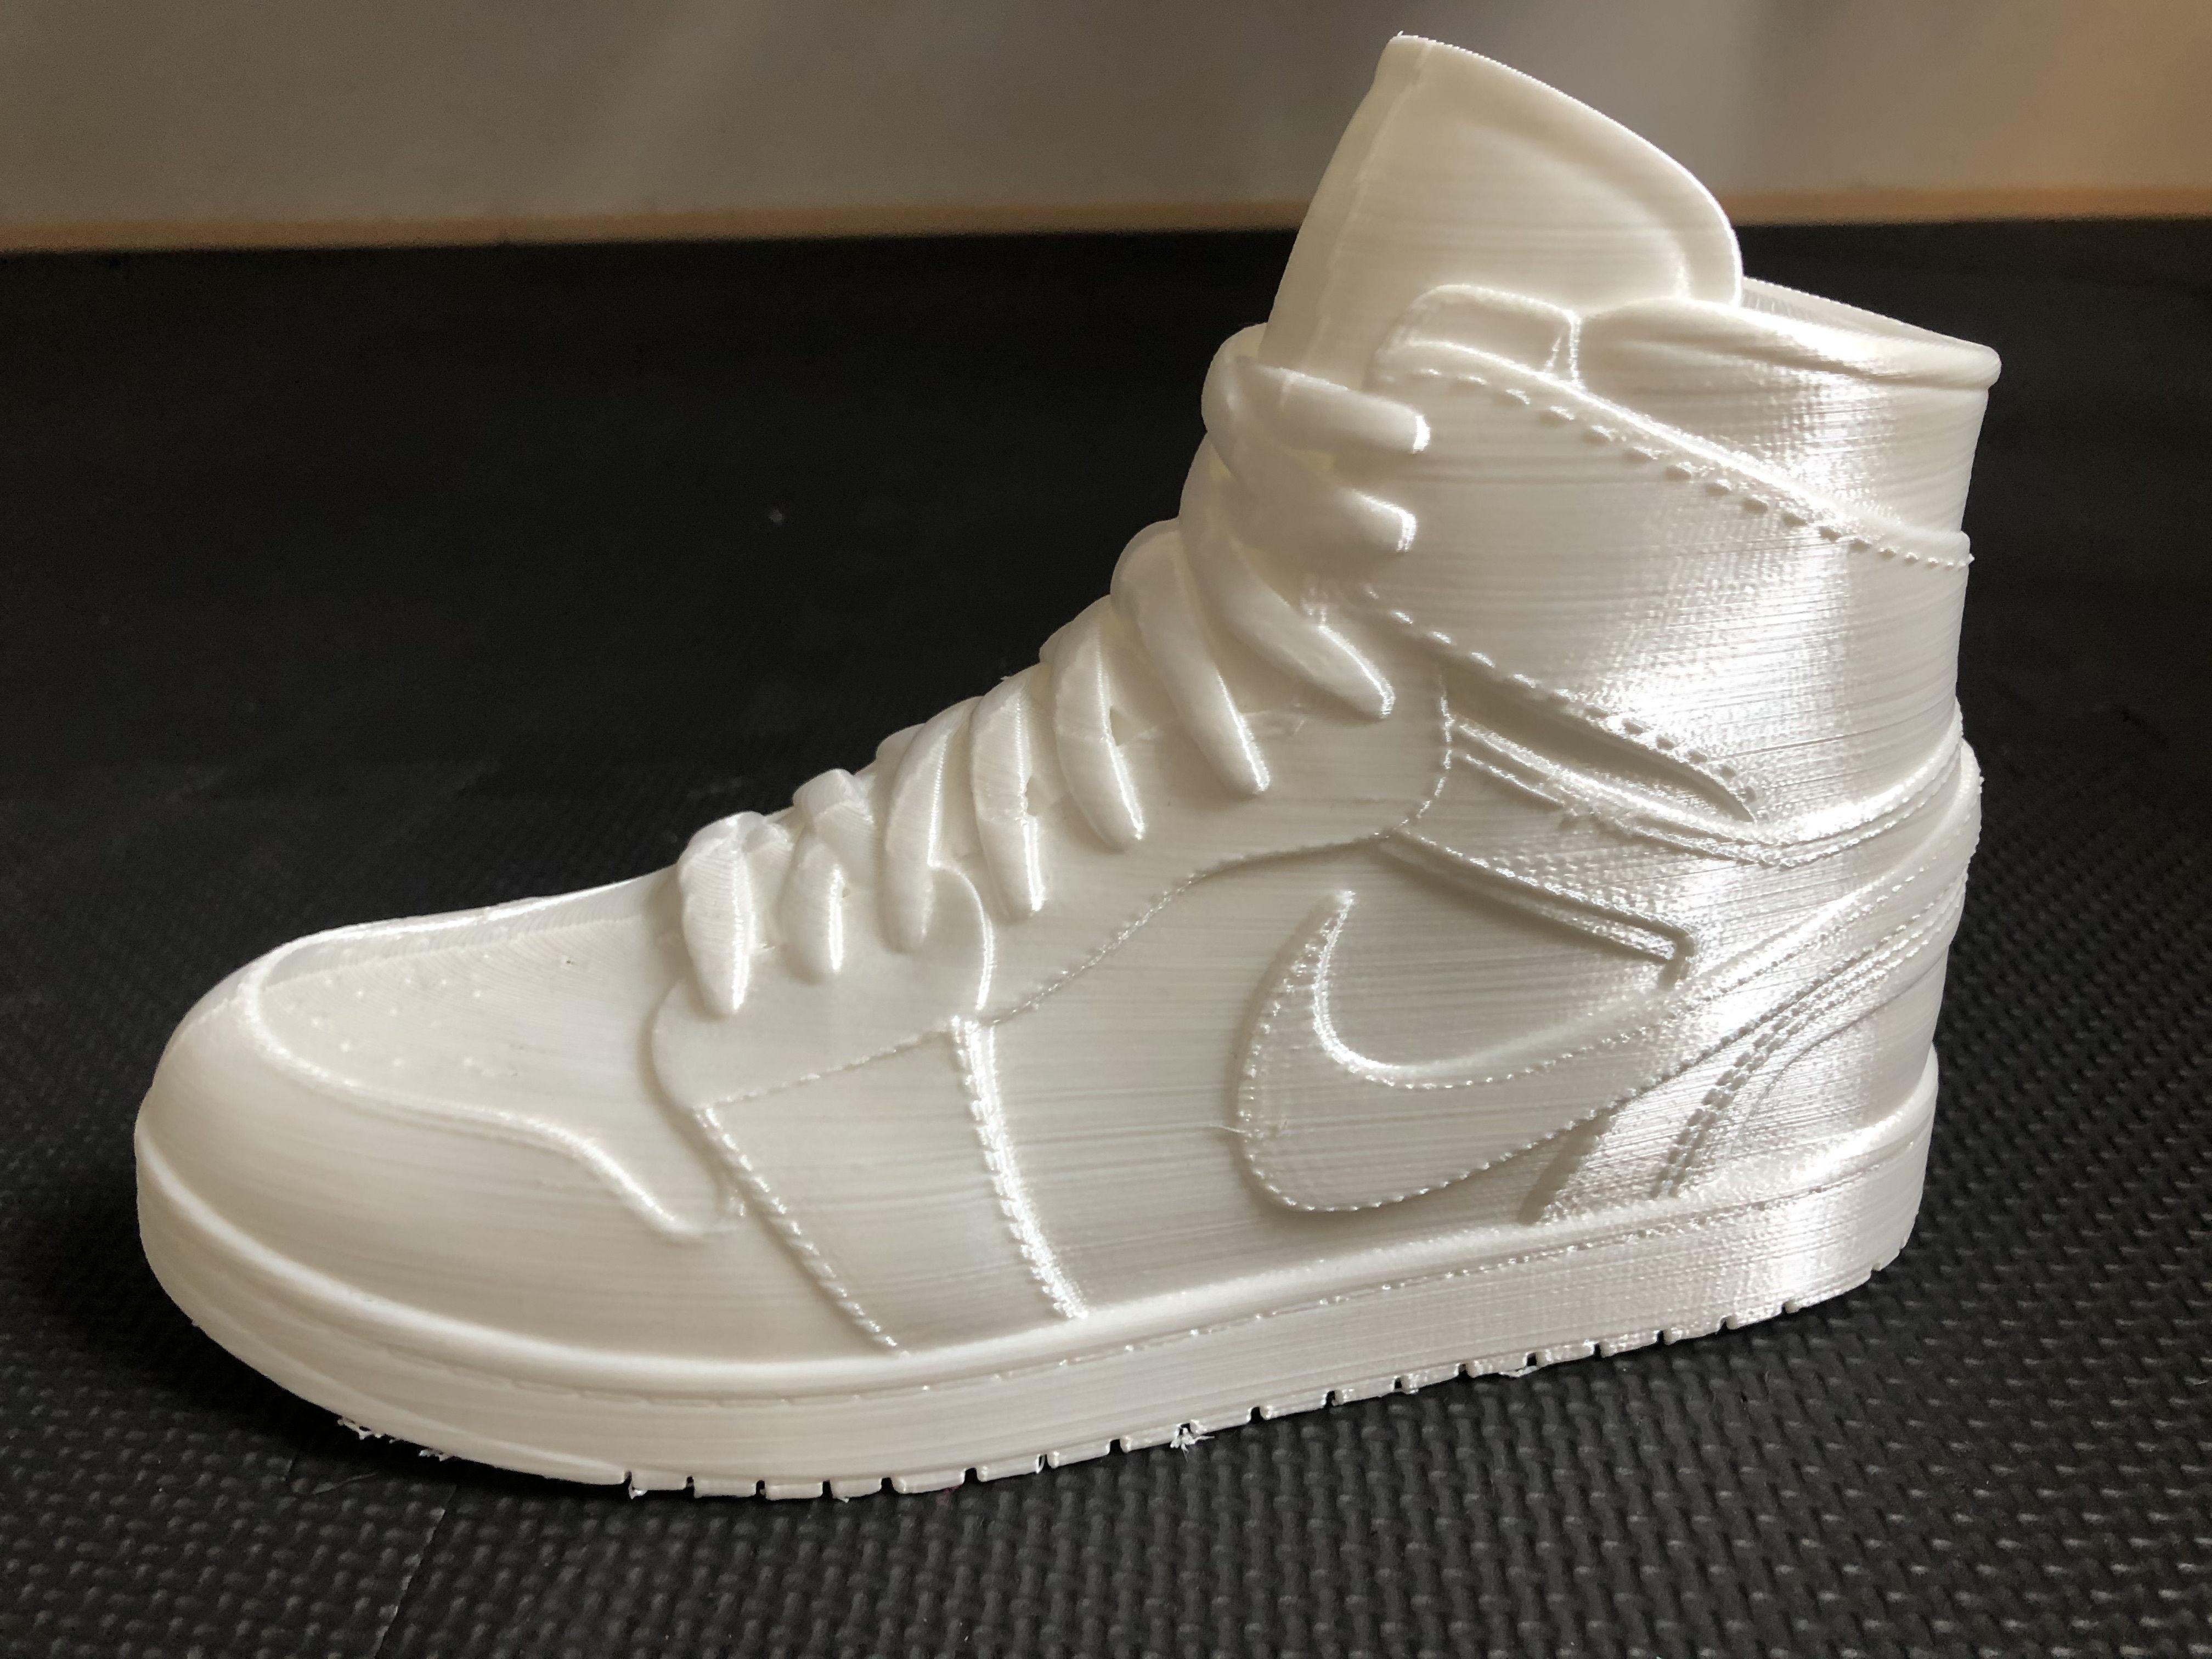 sneakers jordan Modèles d'impression 3D | Mito3D